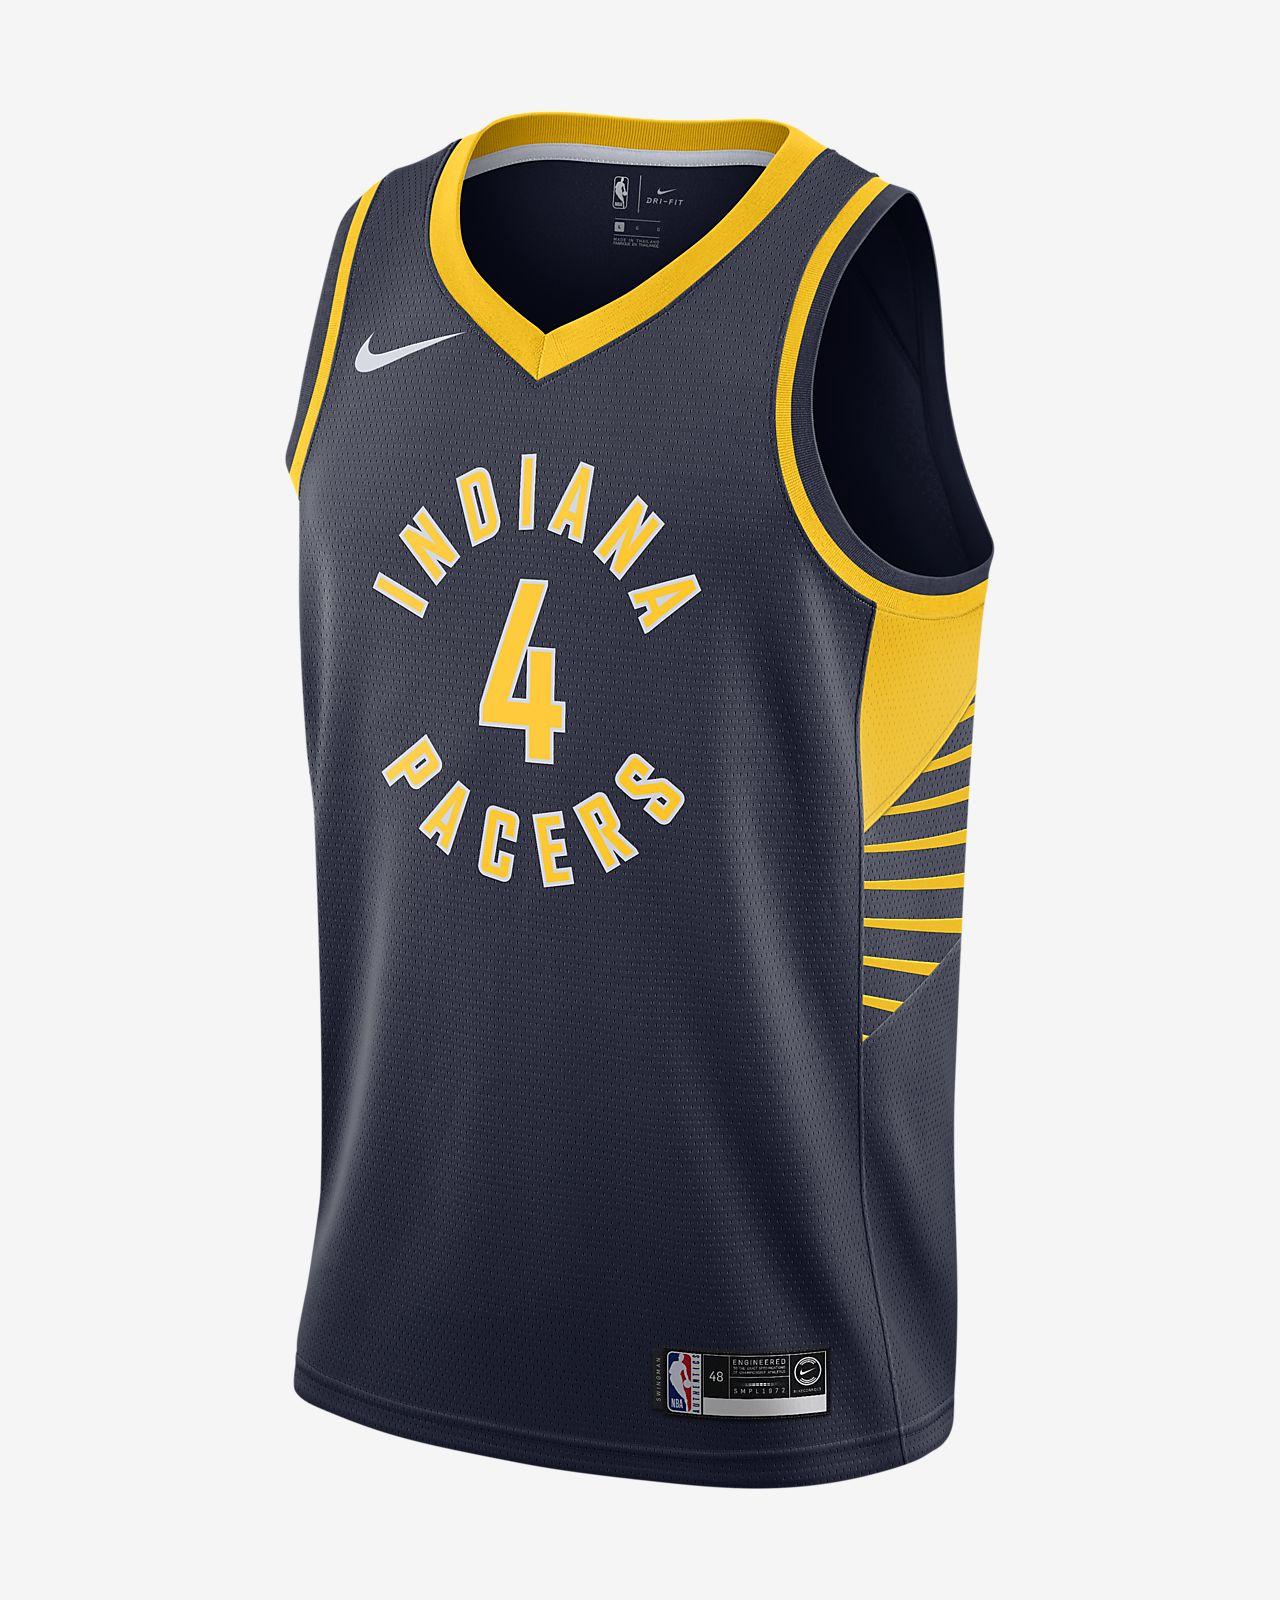 Maglia Nike NBA Connected Victor Oladipo Icon Edition Swingman (Indiana Pacers) - Uomo